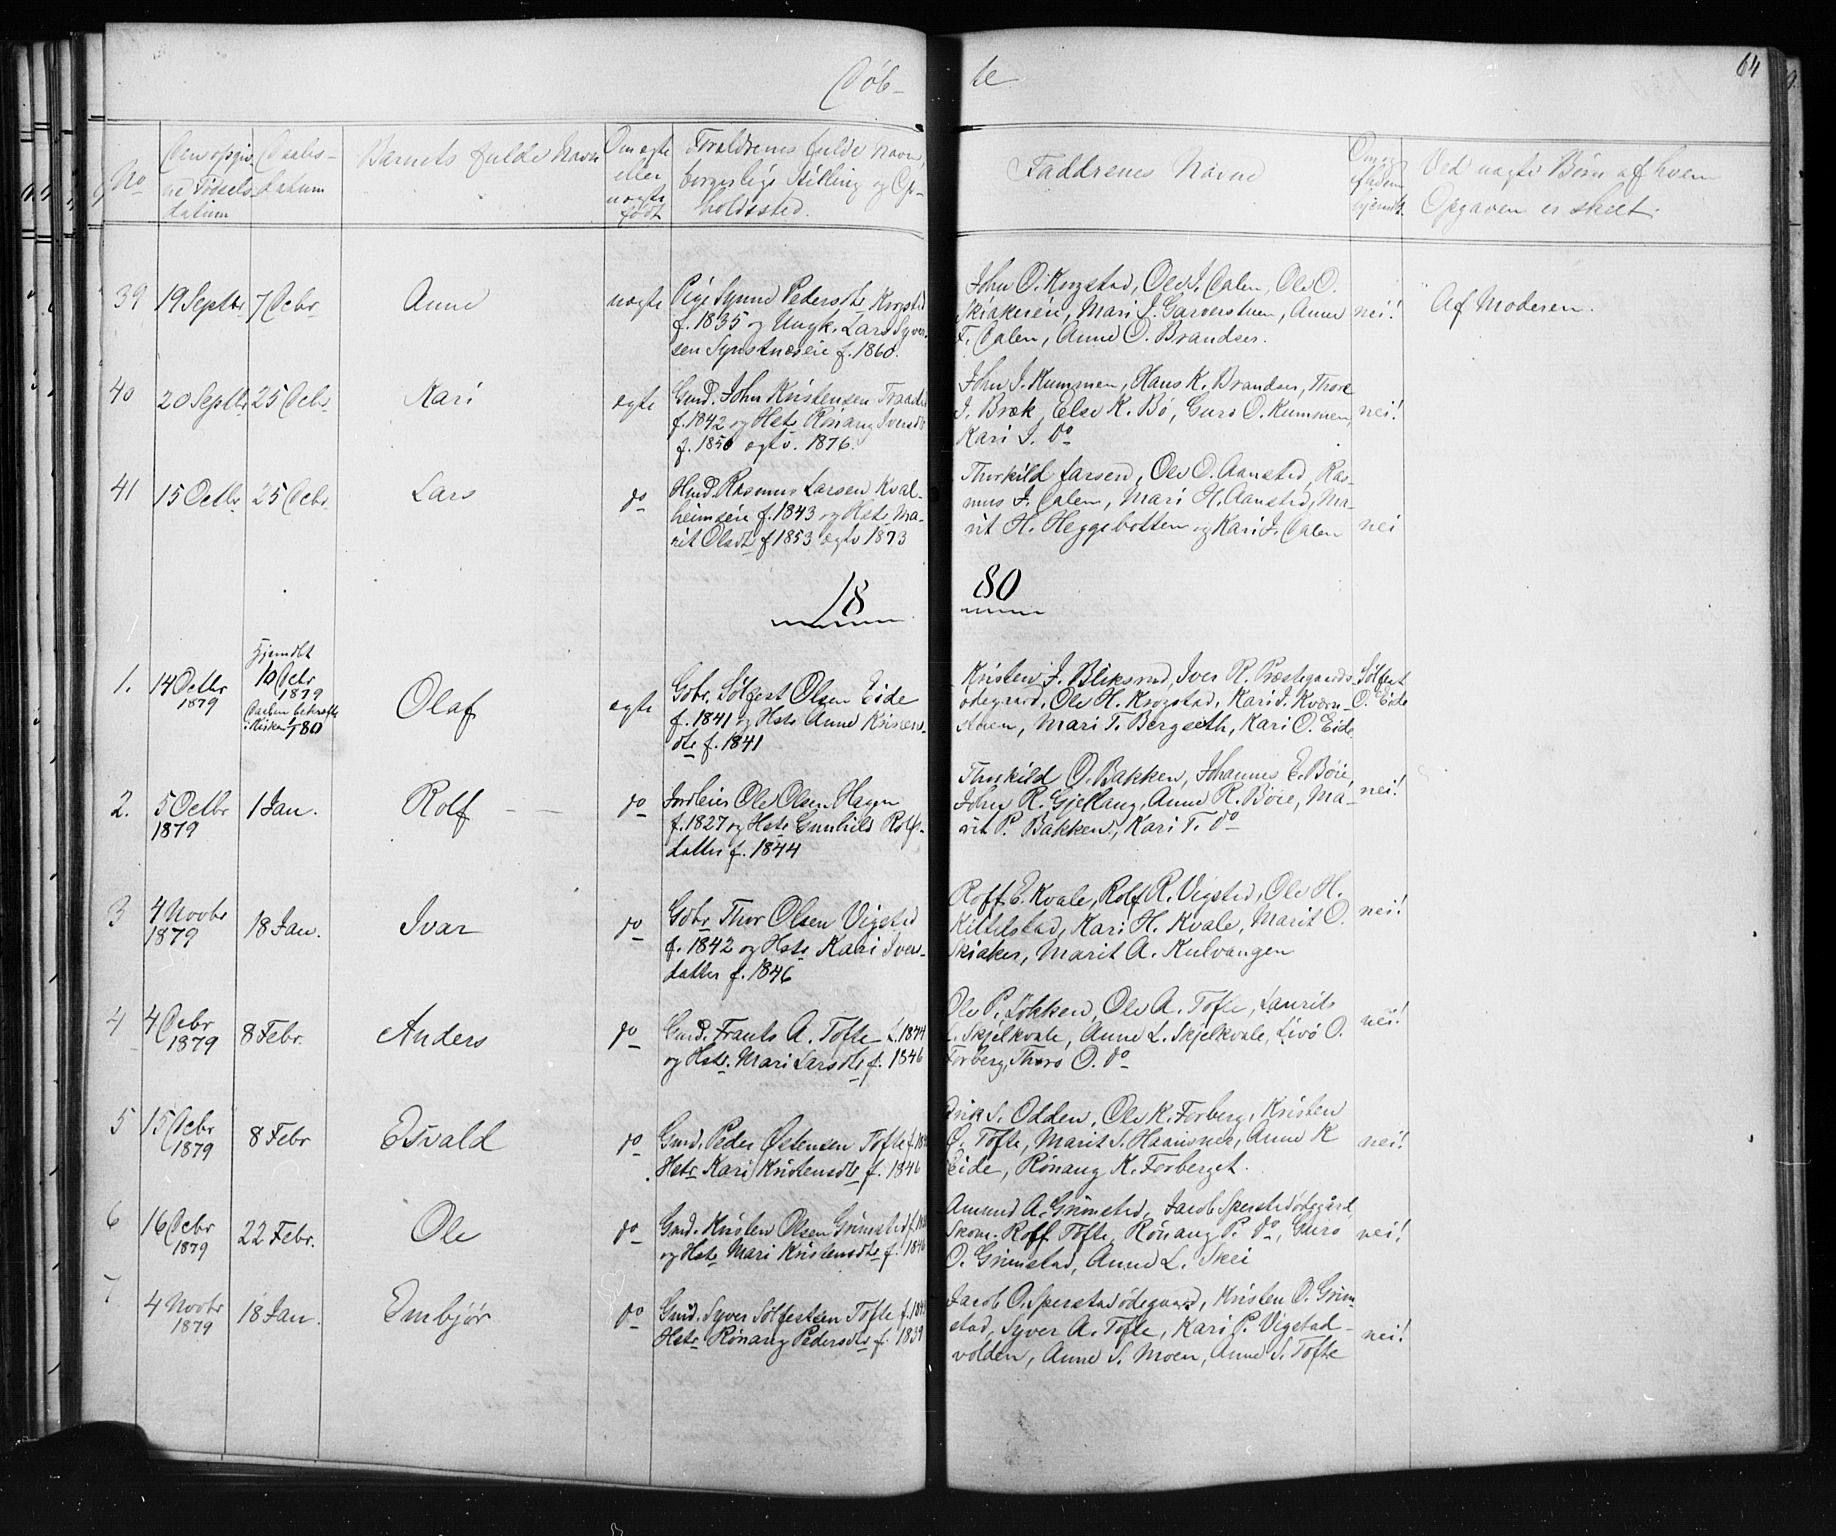 SAH, Skjåk prestekontor, Klokkerbok nr. 1, 1865-1893, s. 64